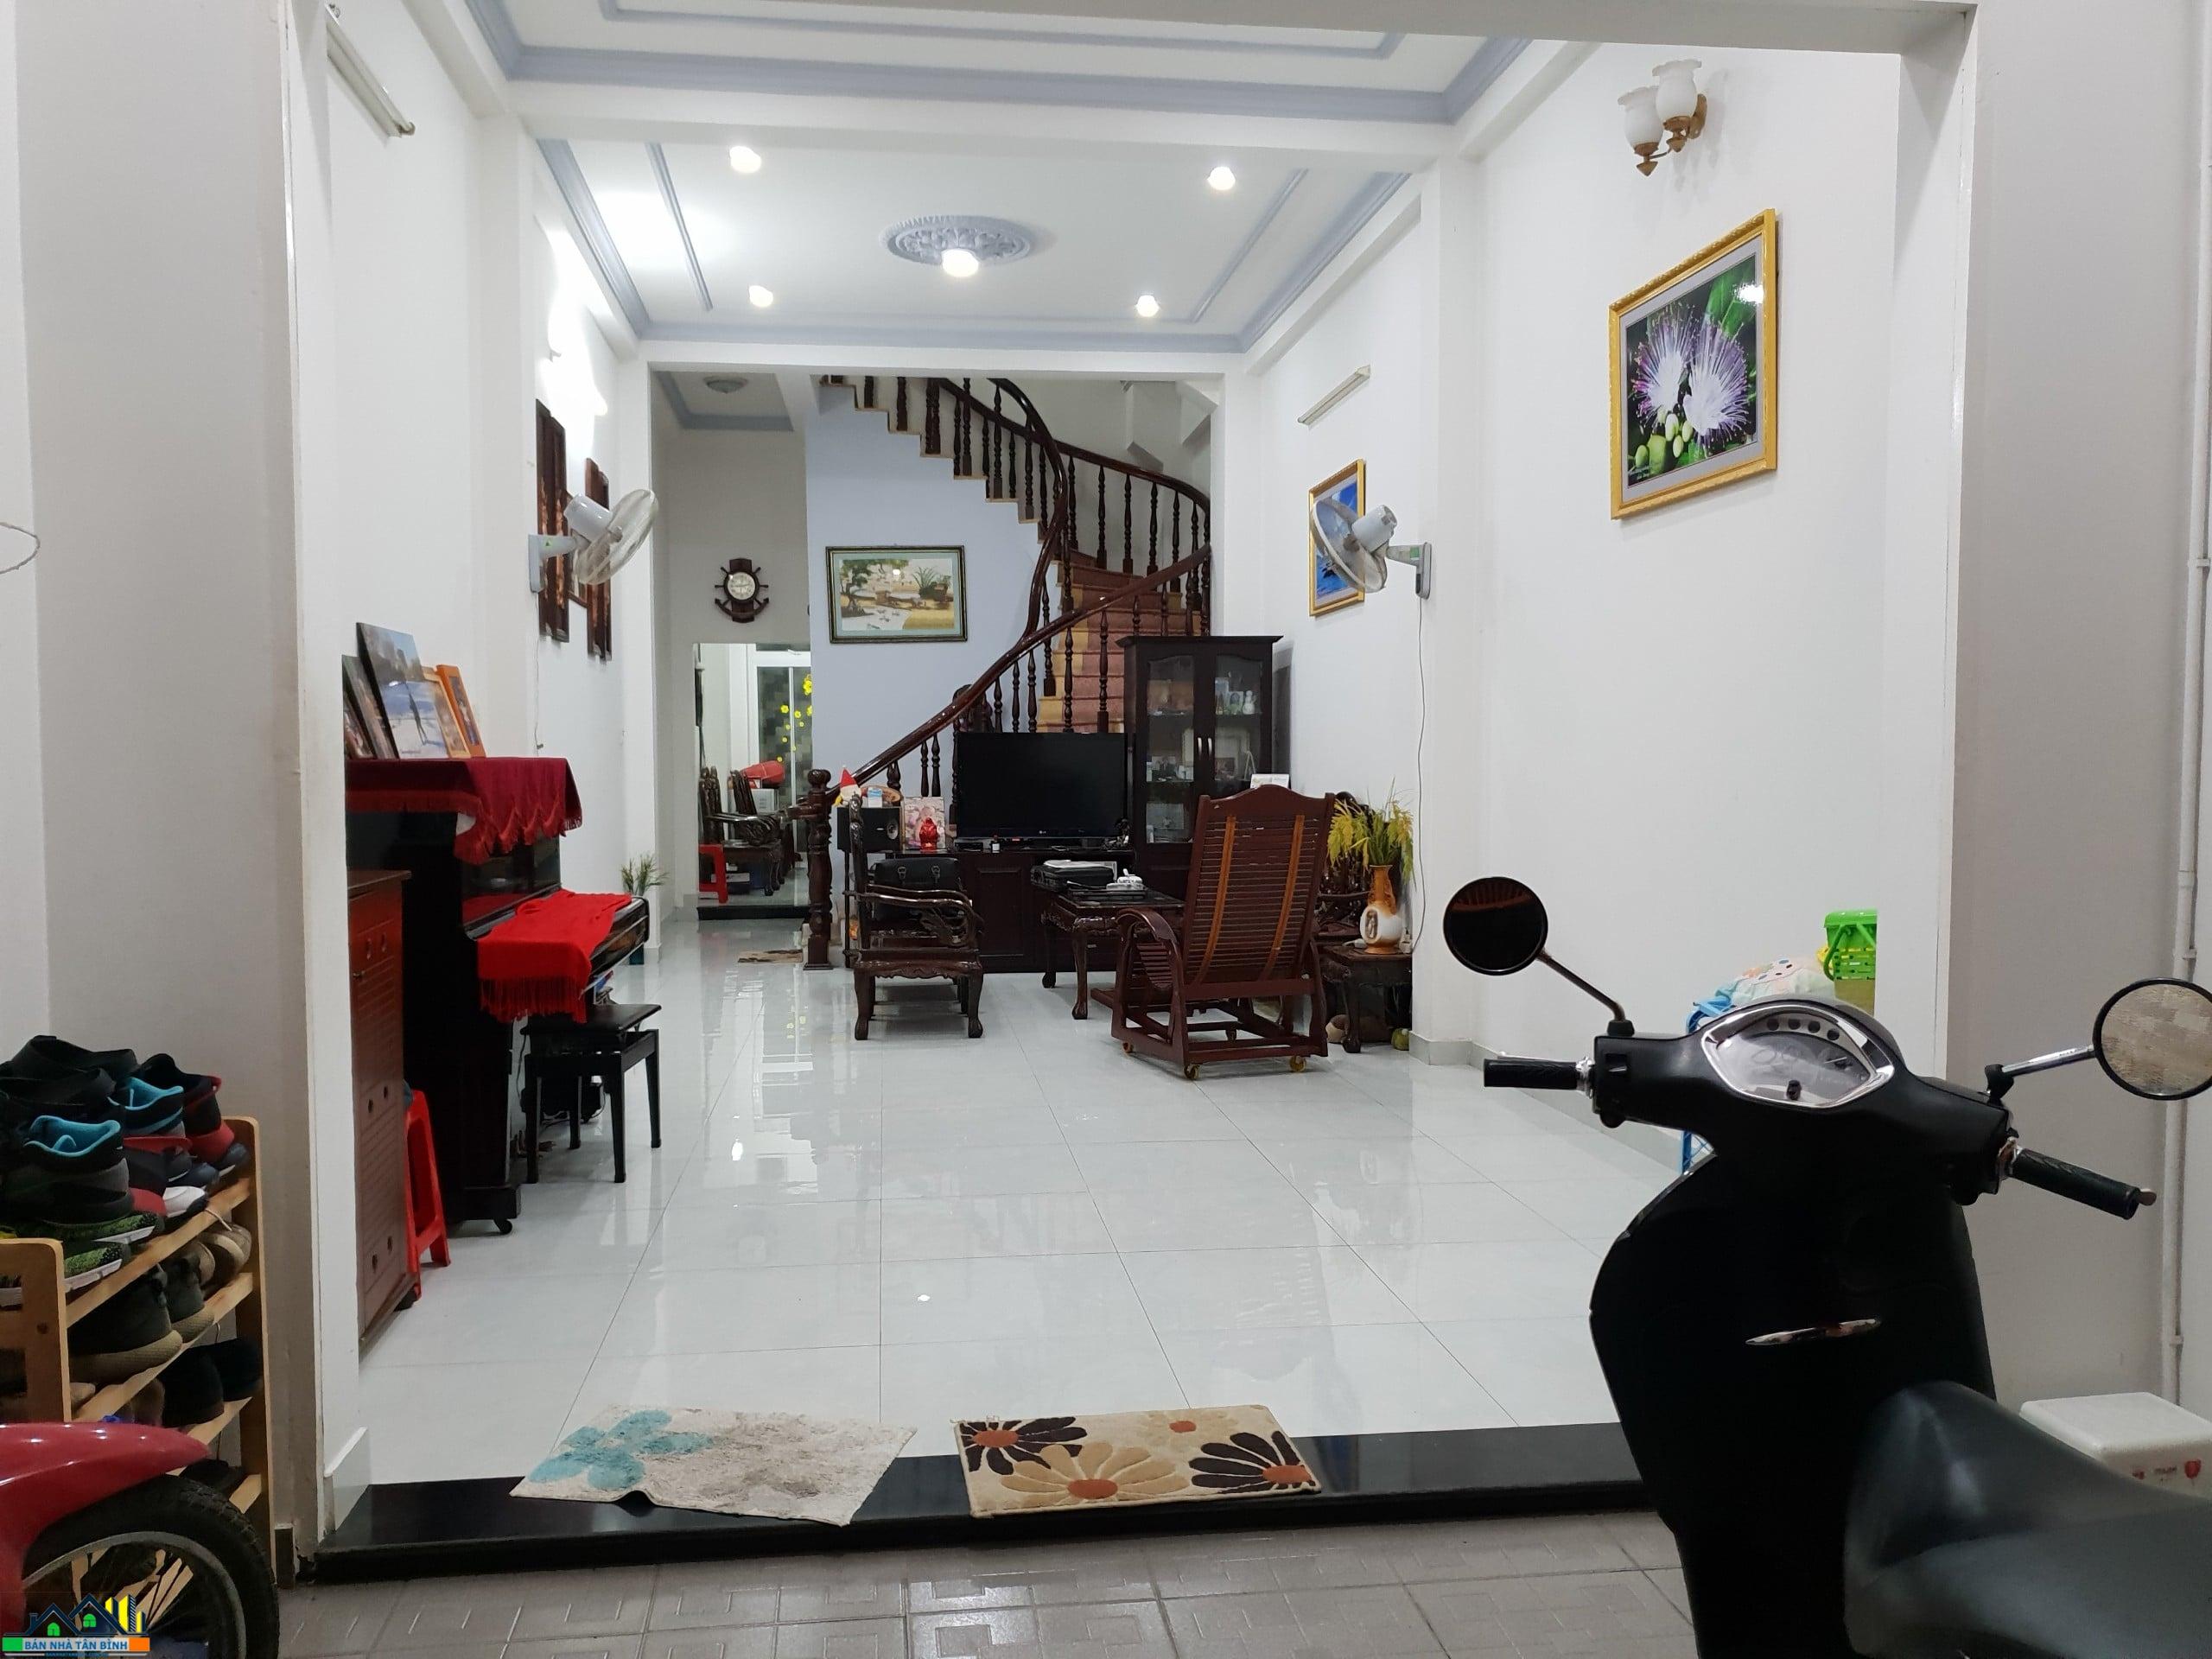 mua-nha-phuong-2-tan-binh (5)